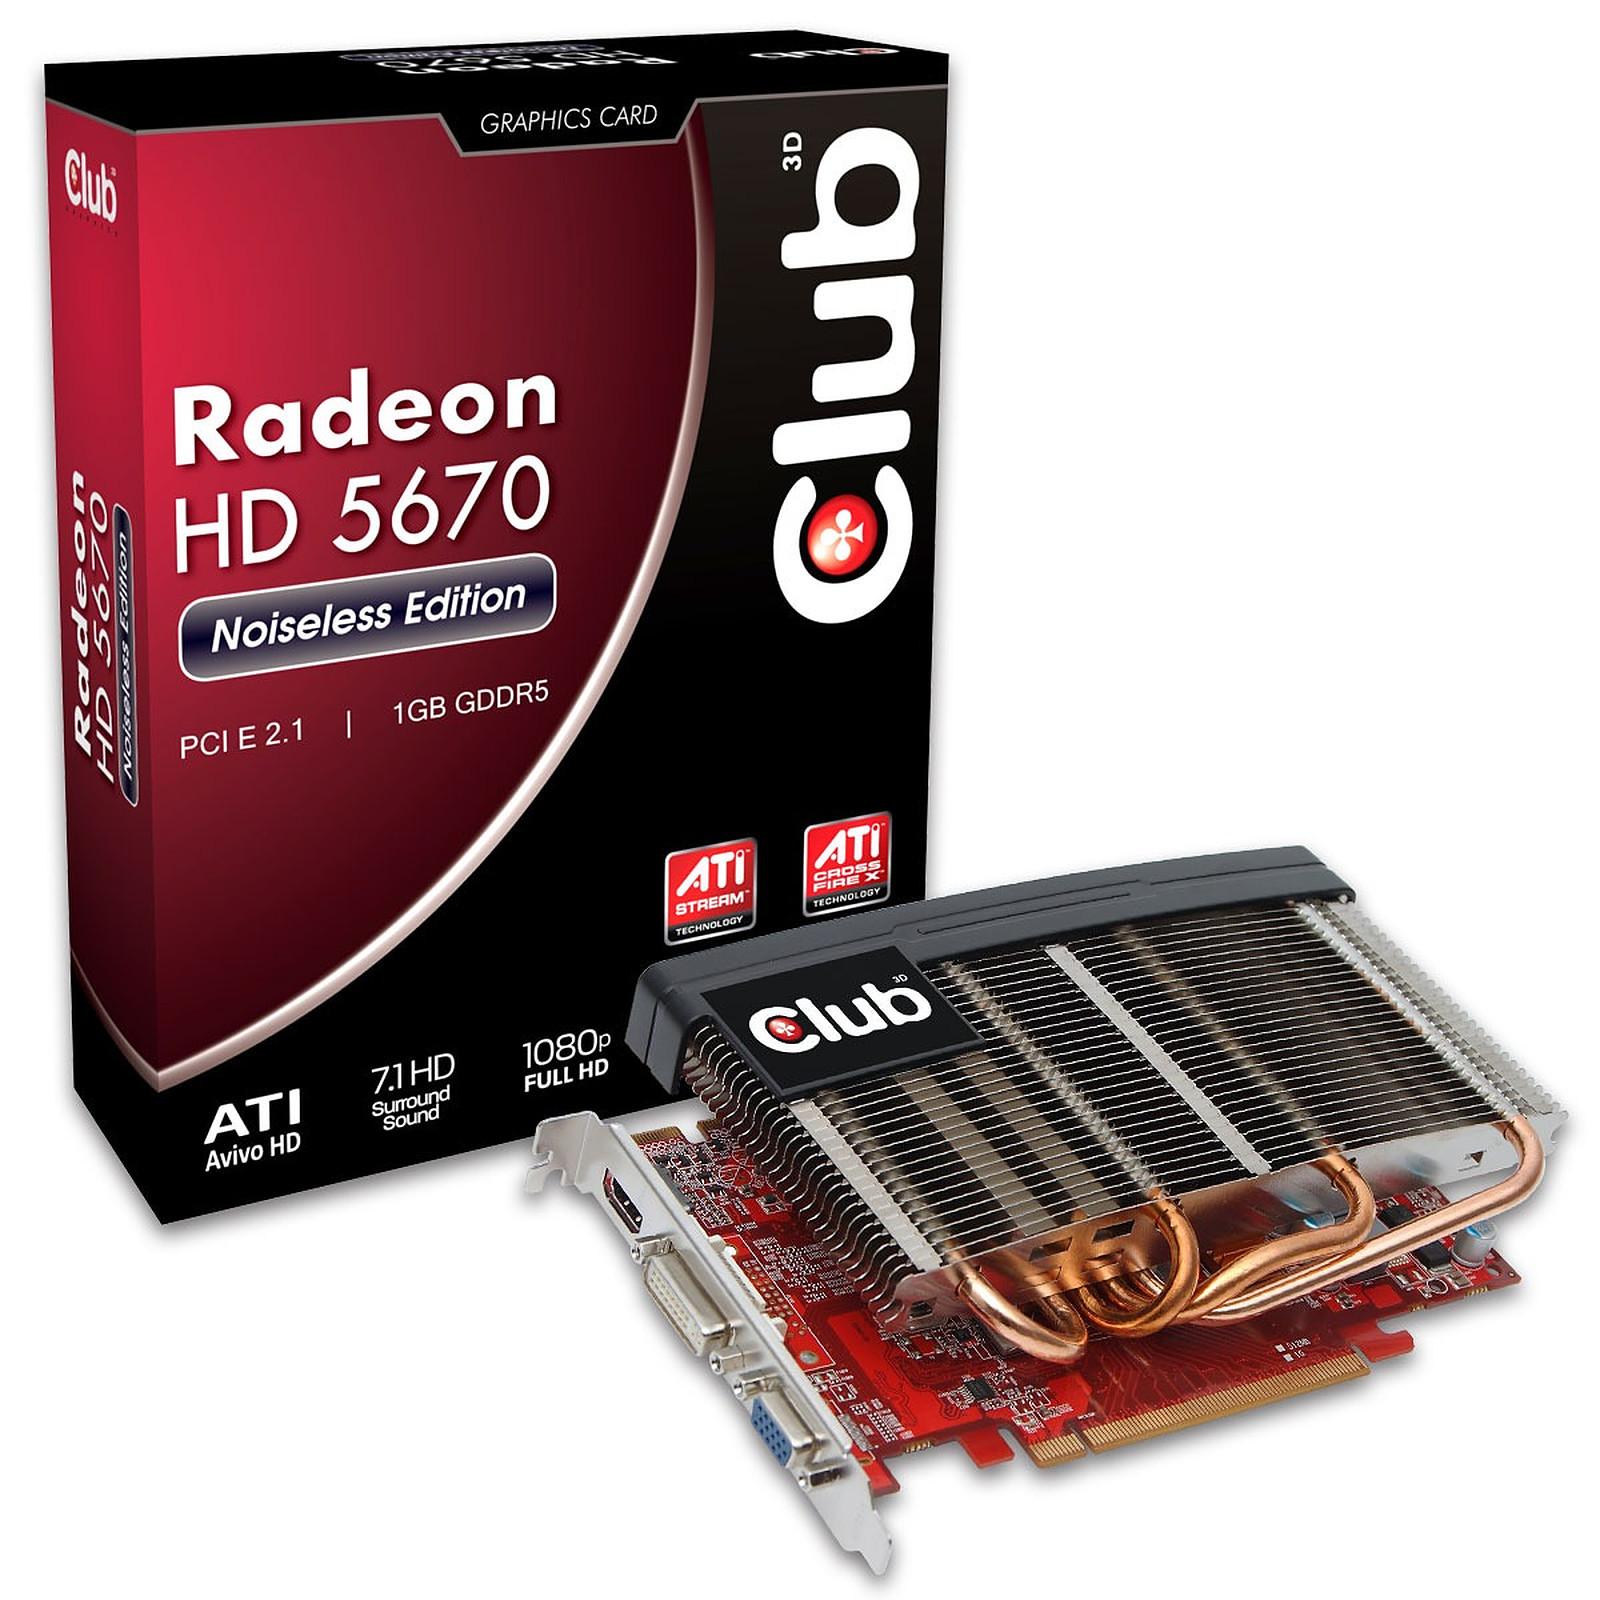 Club 3D Radeon HD 5670 Noiseless Edition 1024 MB